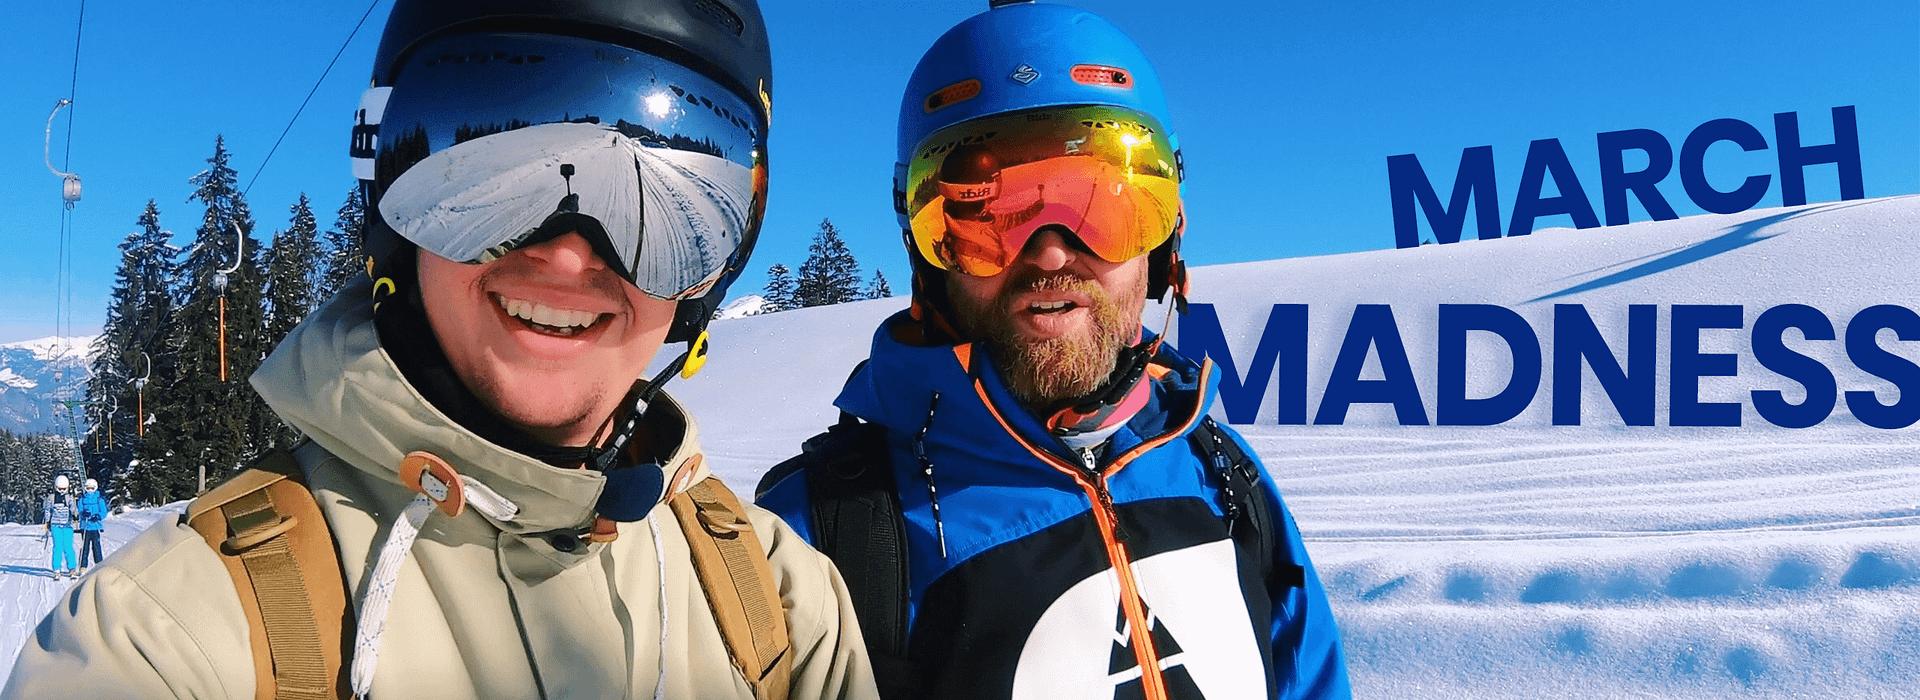 Ridr Edge Snowsports Goggles